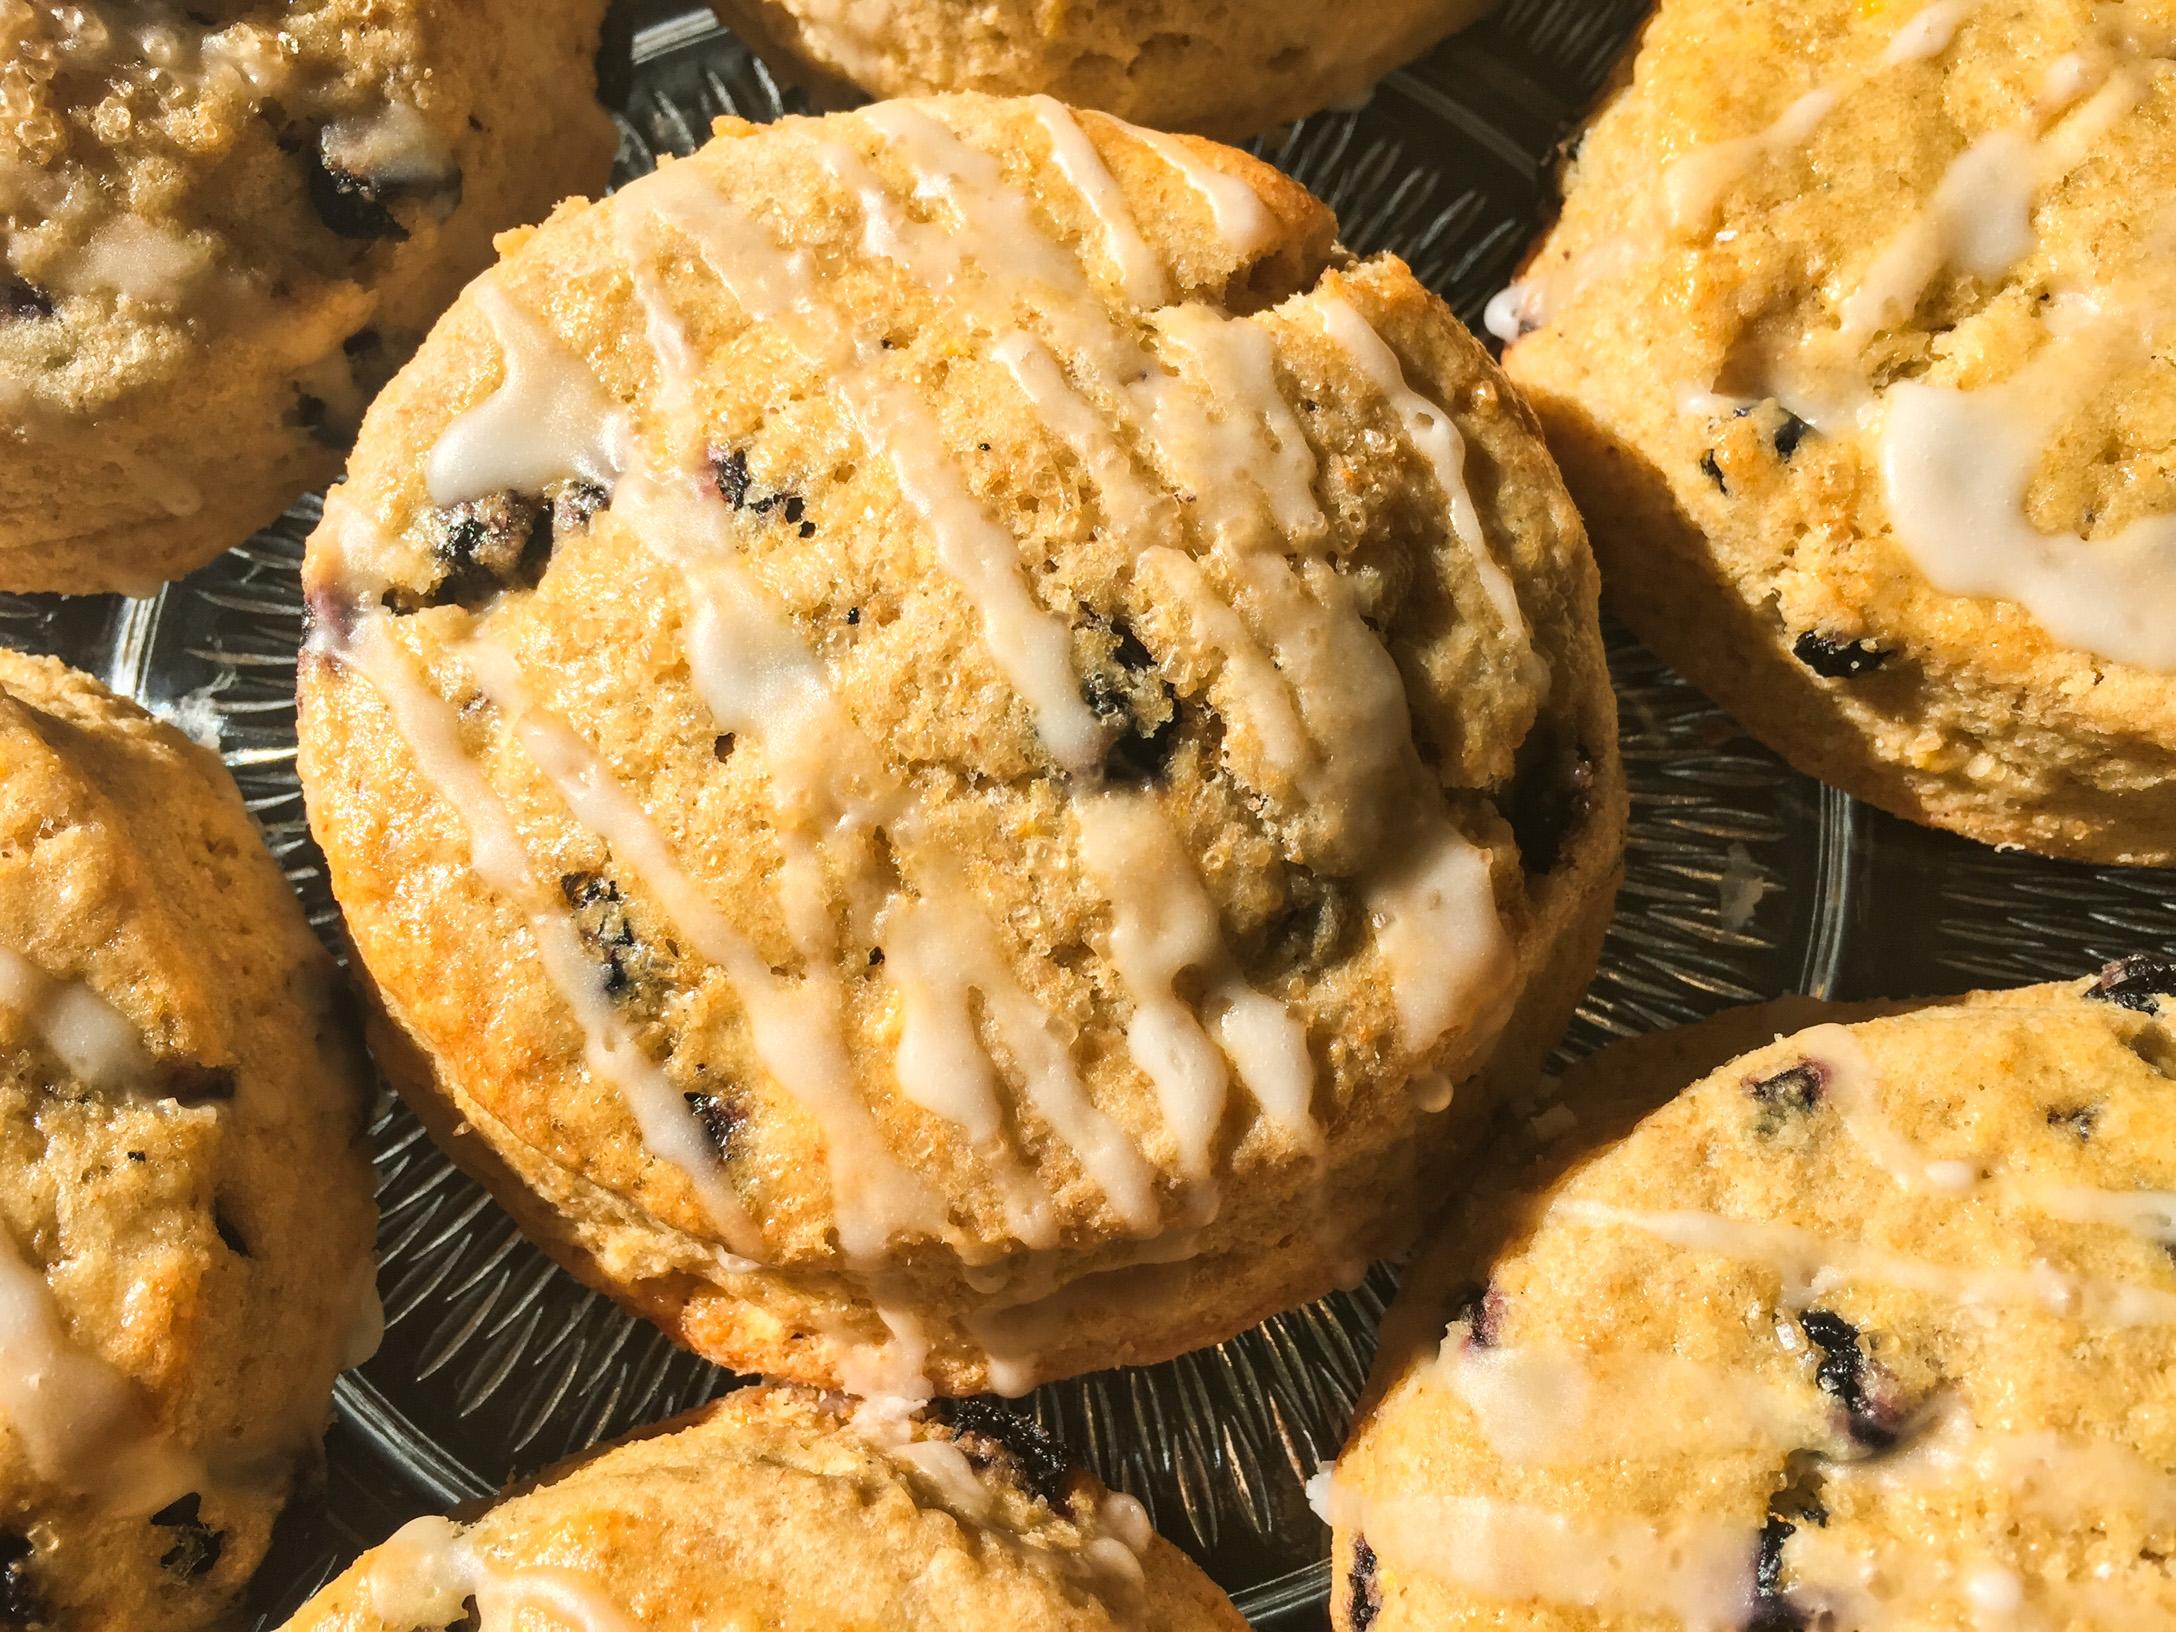 Lemon-blueberry scones